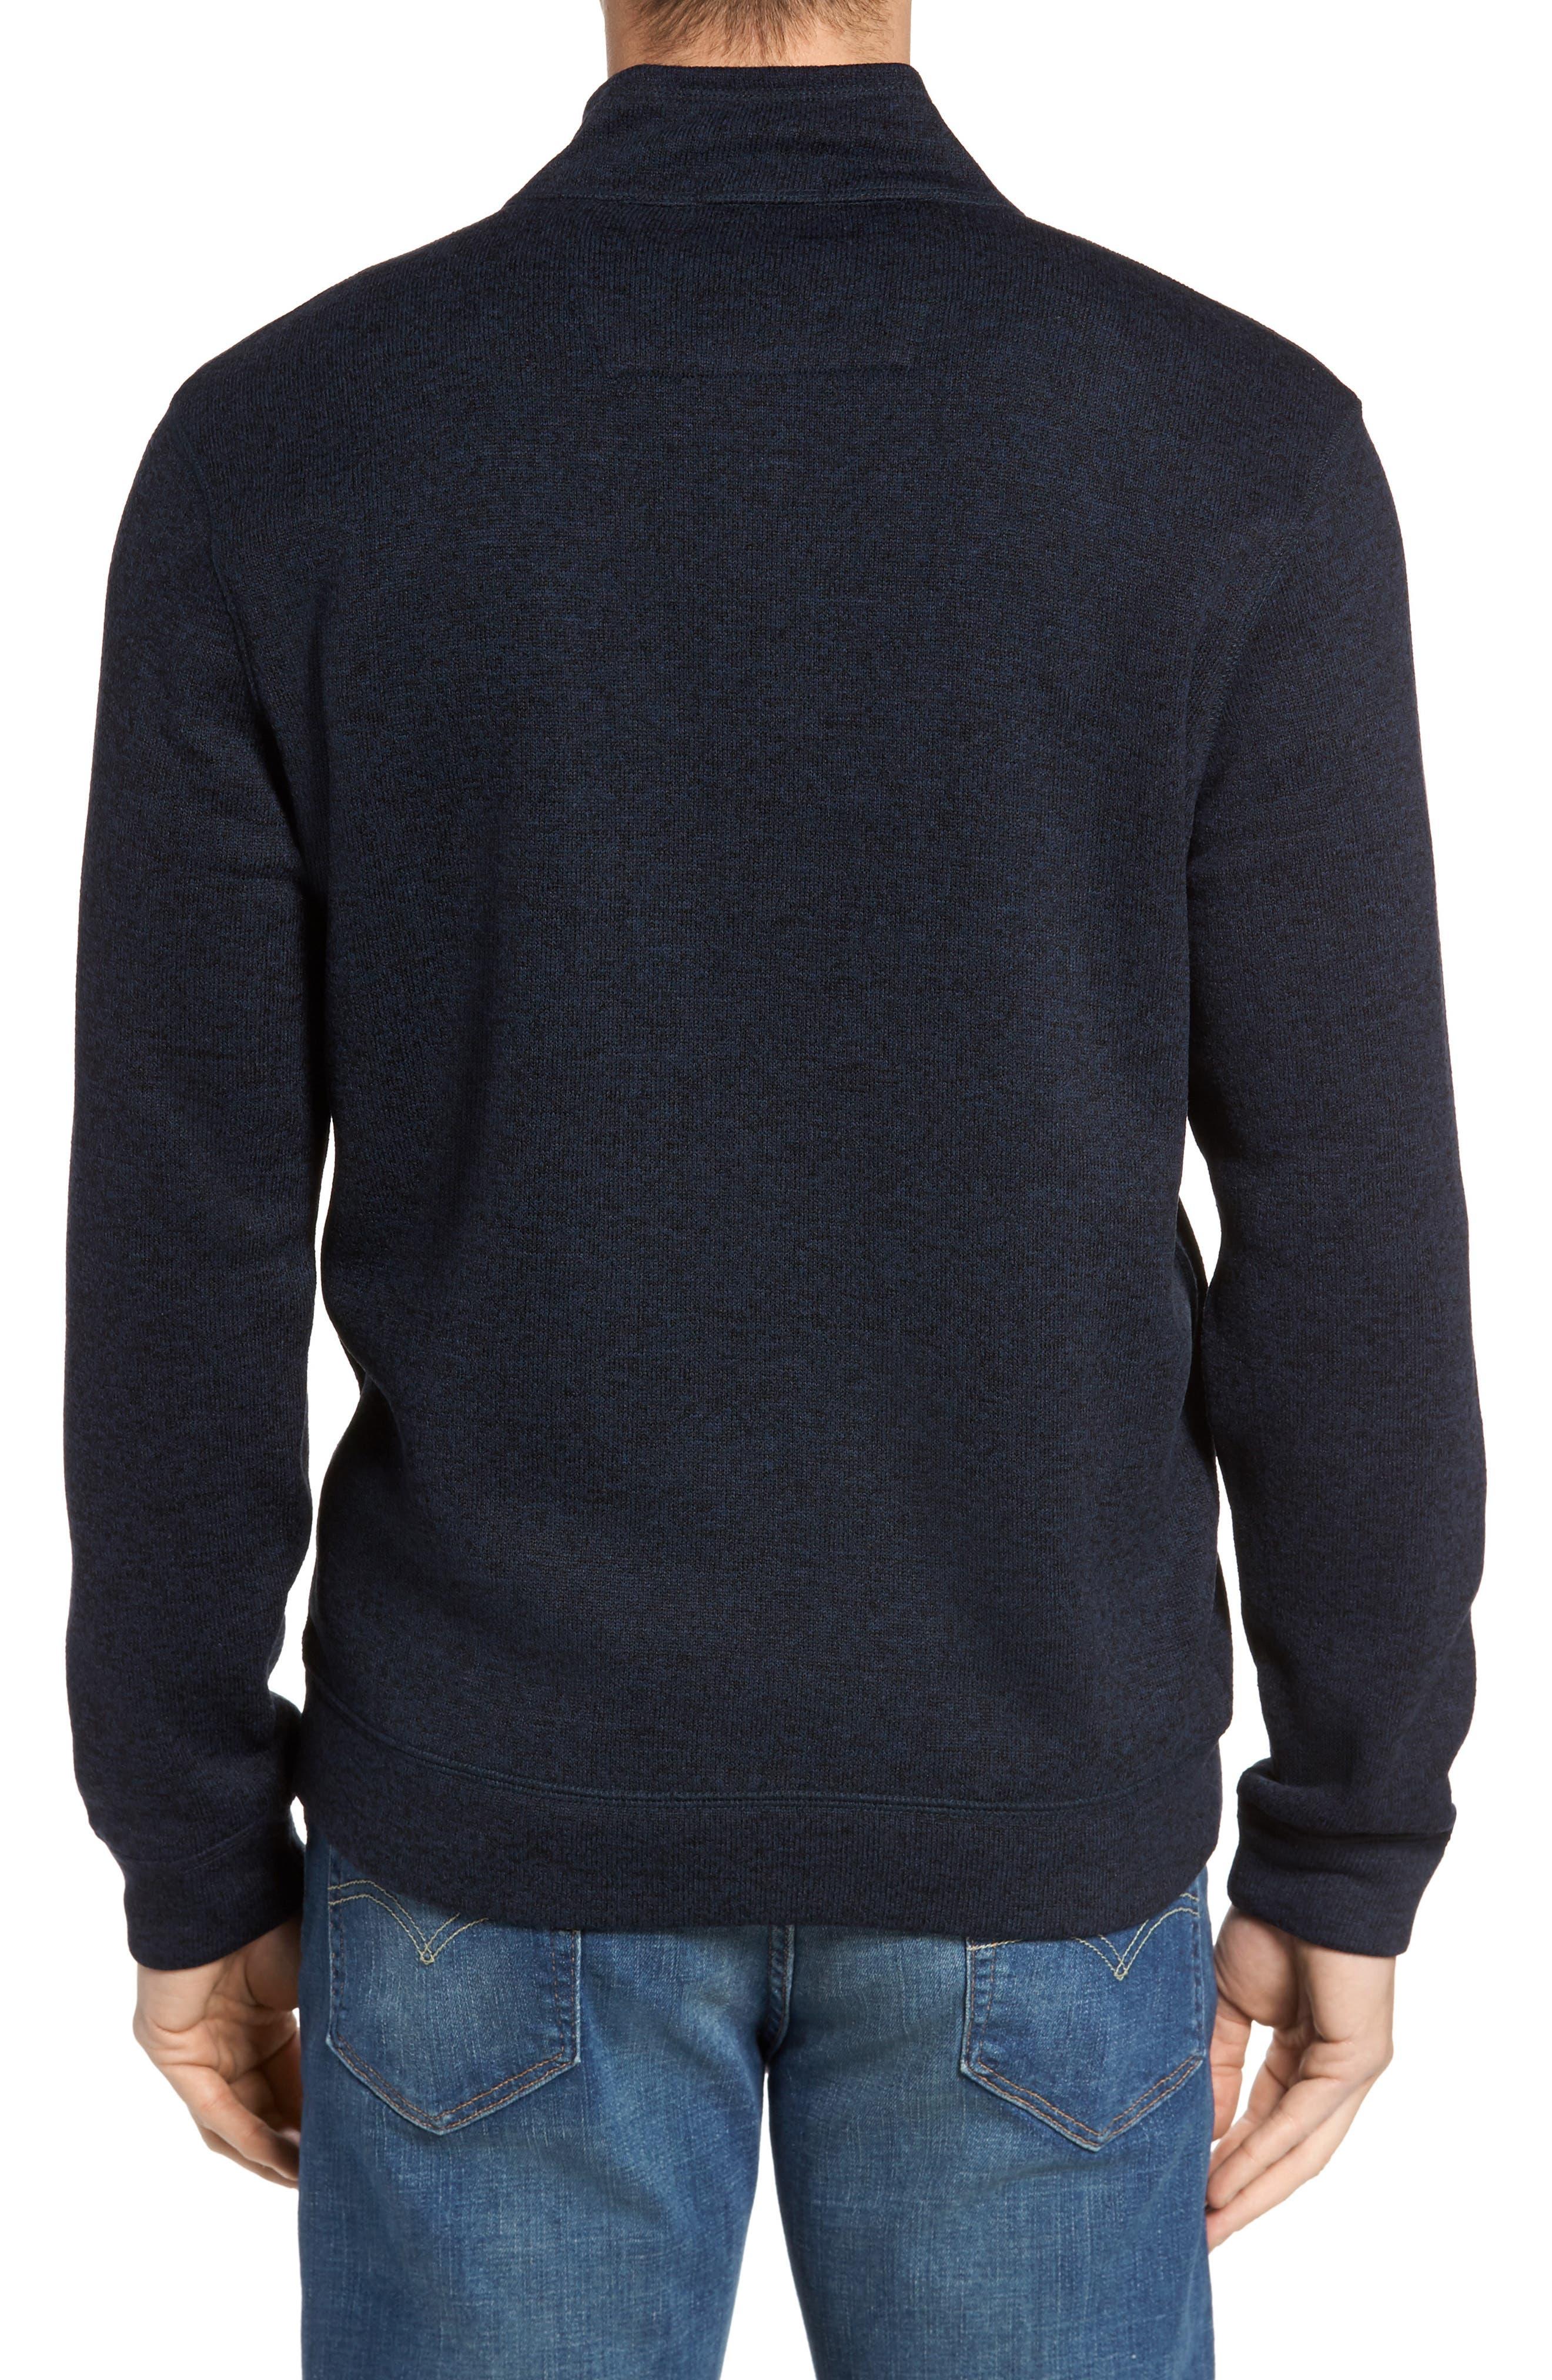 Sweater Knit Fleece Zip Front Jacket,                             Alternate thumbnail 6, color,